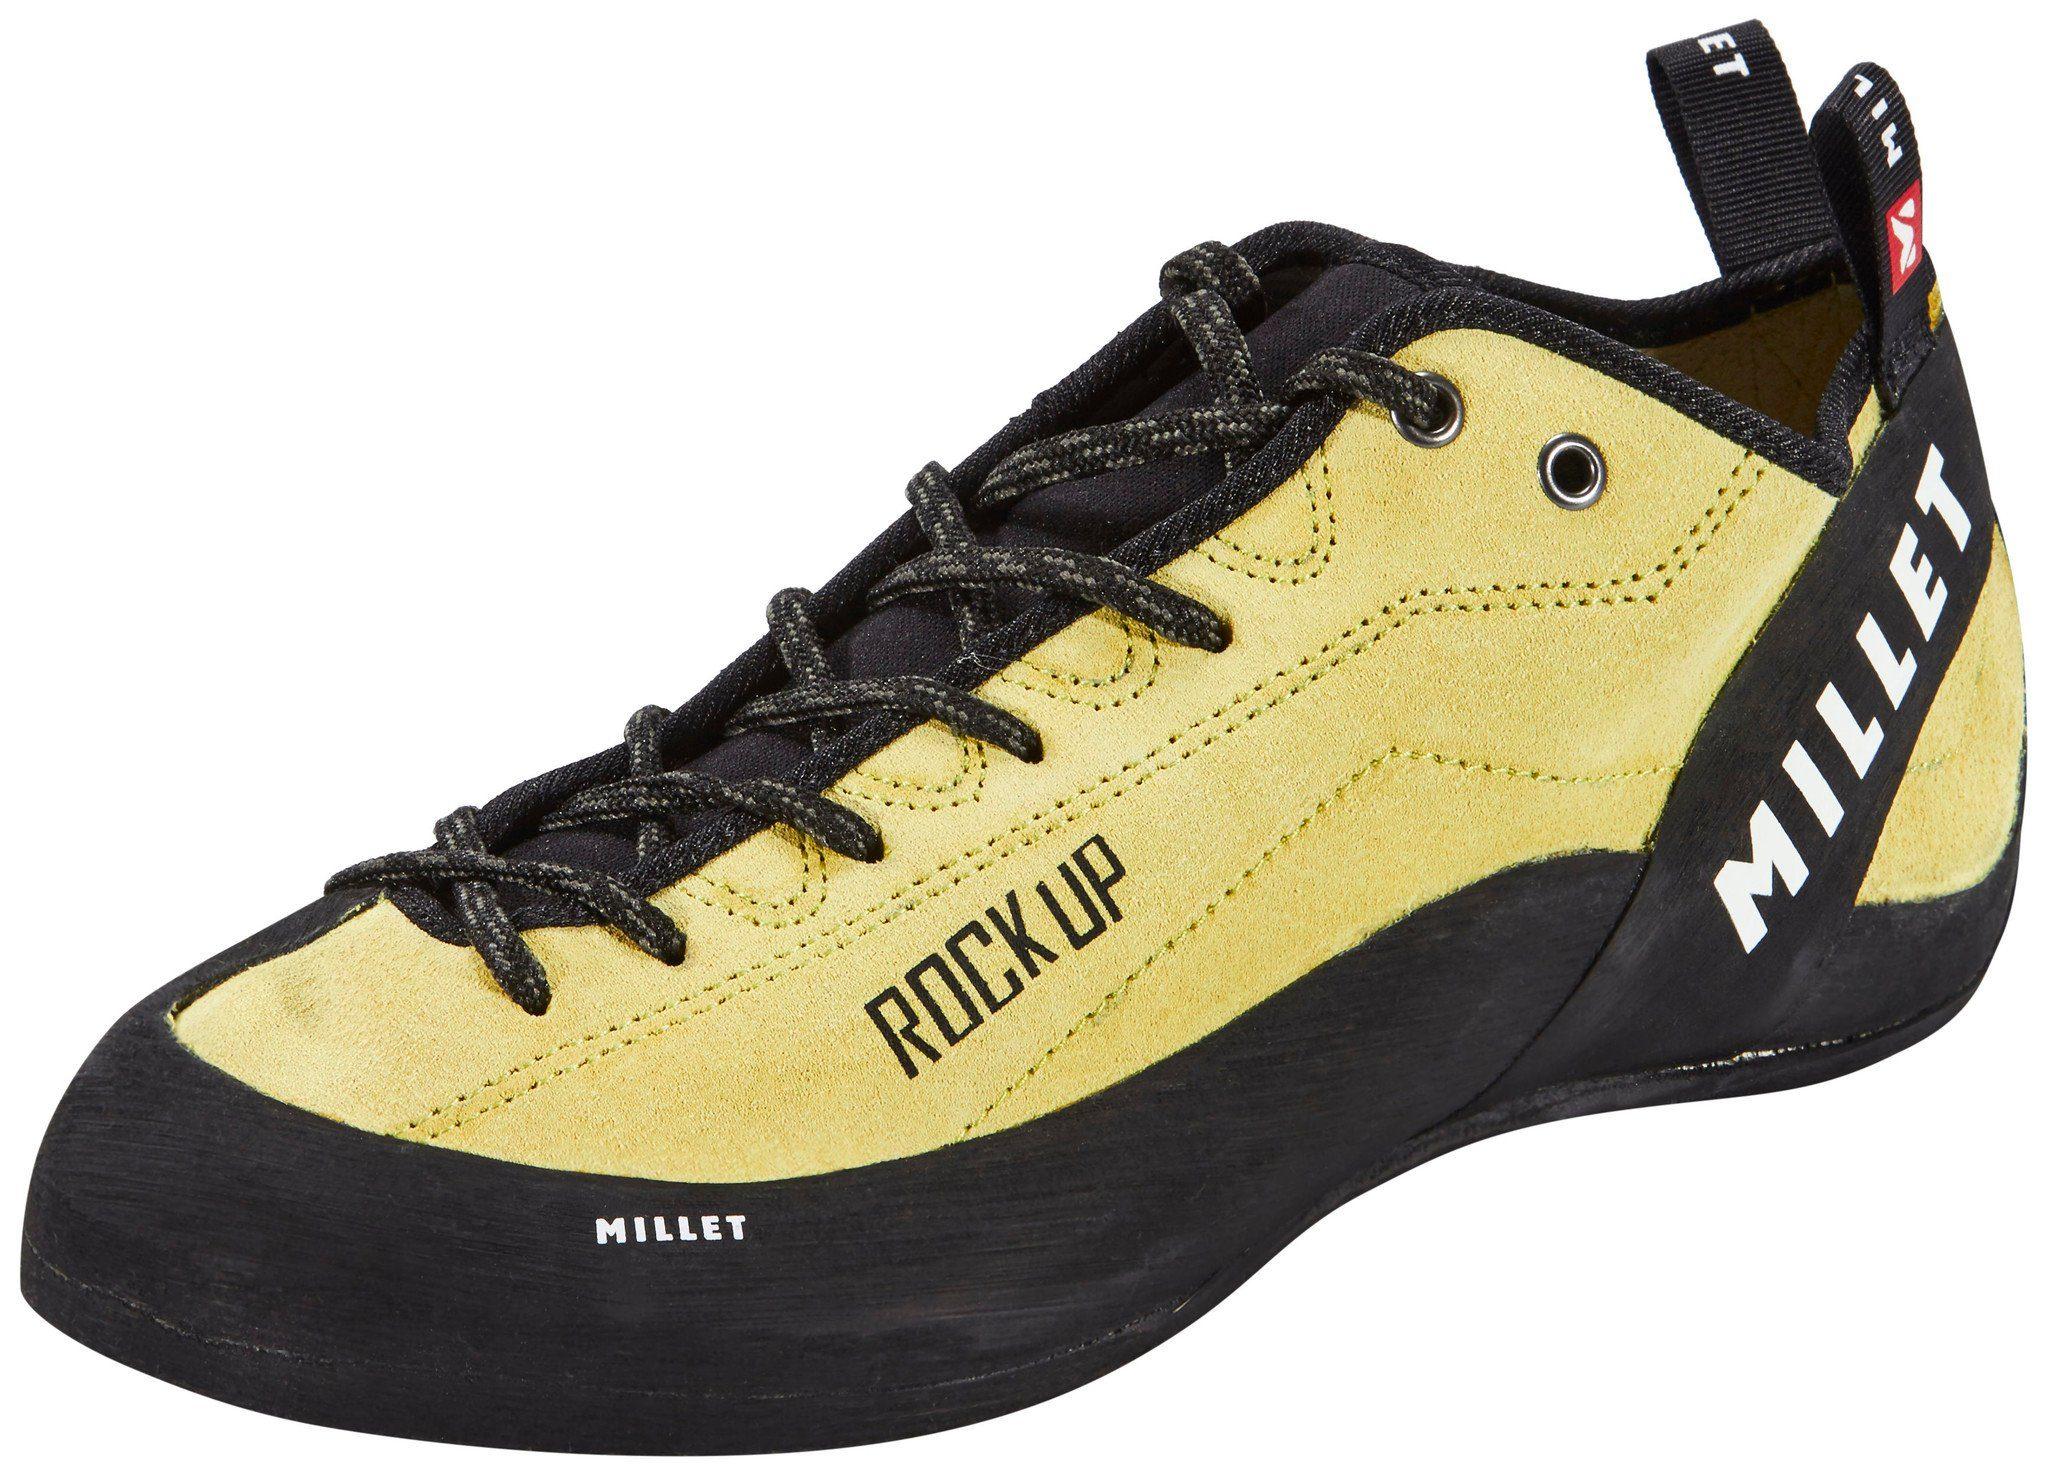 Millet Kletterschuh »Rock Up Climbing Shoes«